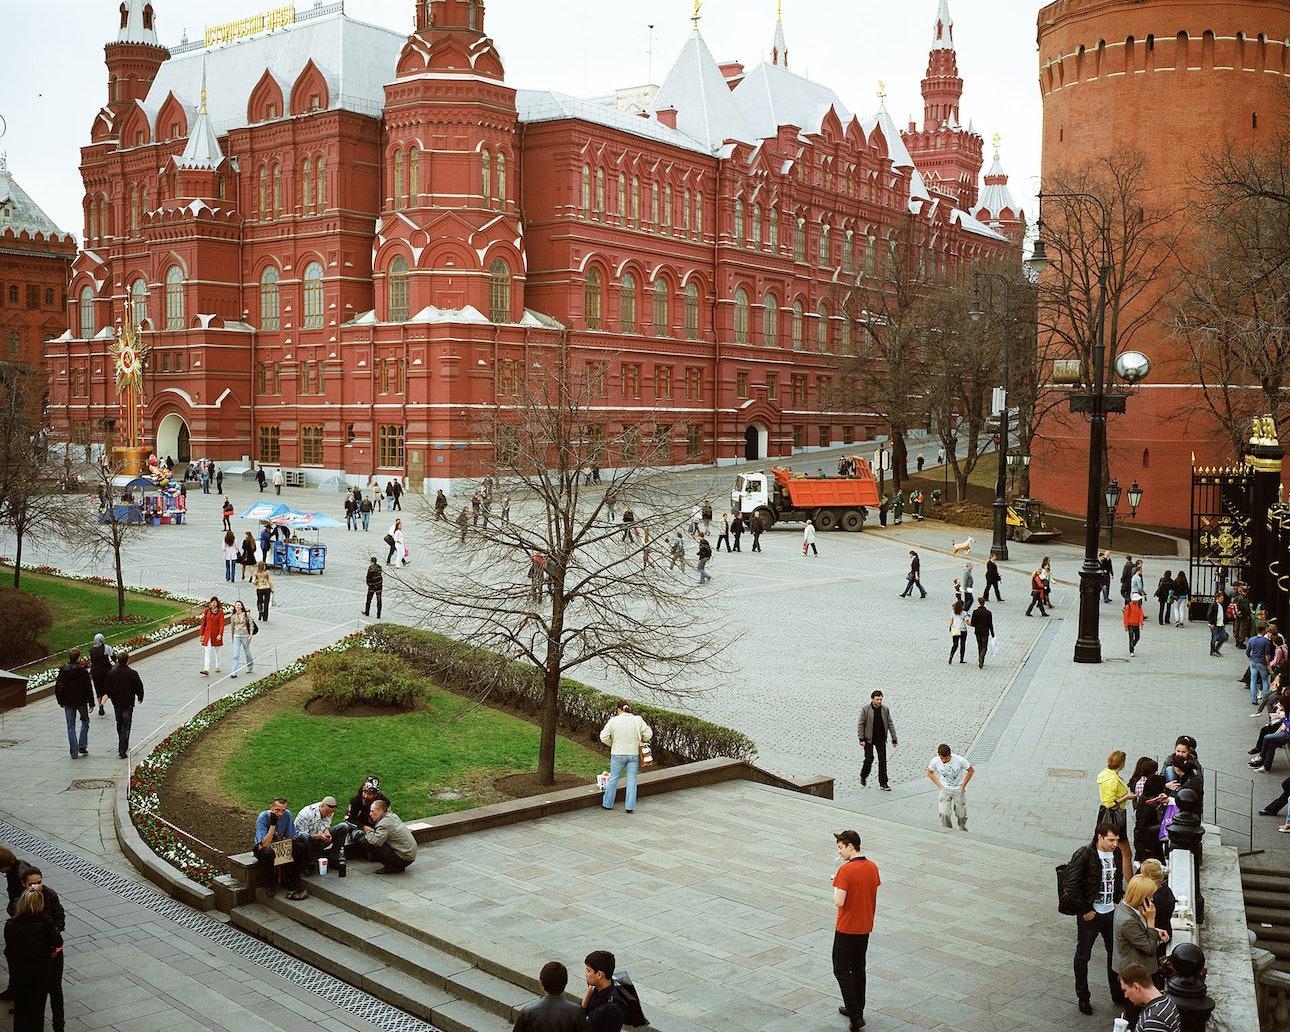 Petr_Antonov_Trees,-cars,-figures-of-people,-assorted-barriers_1